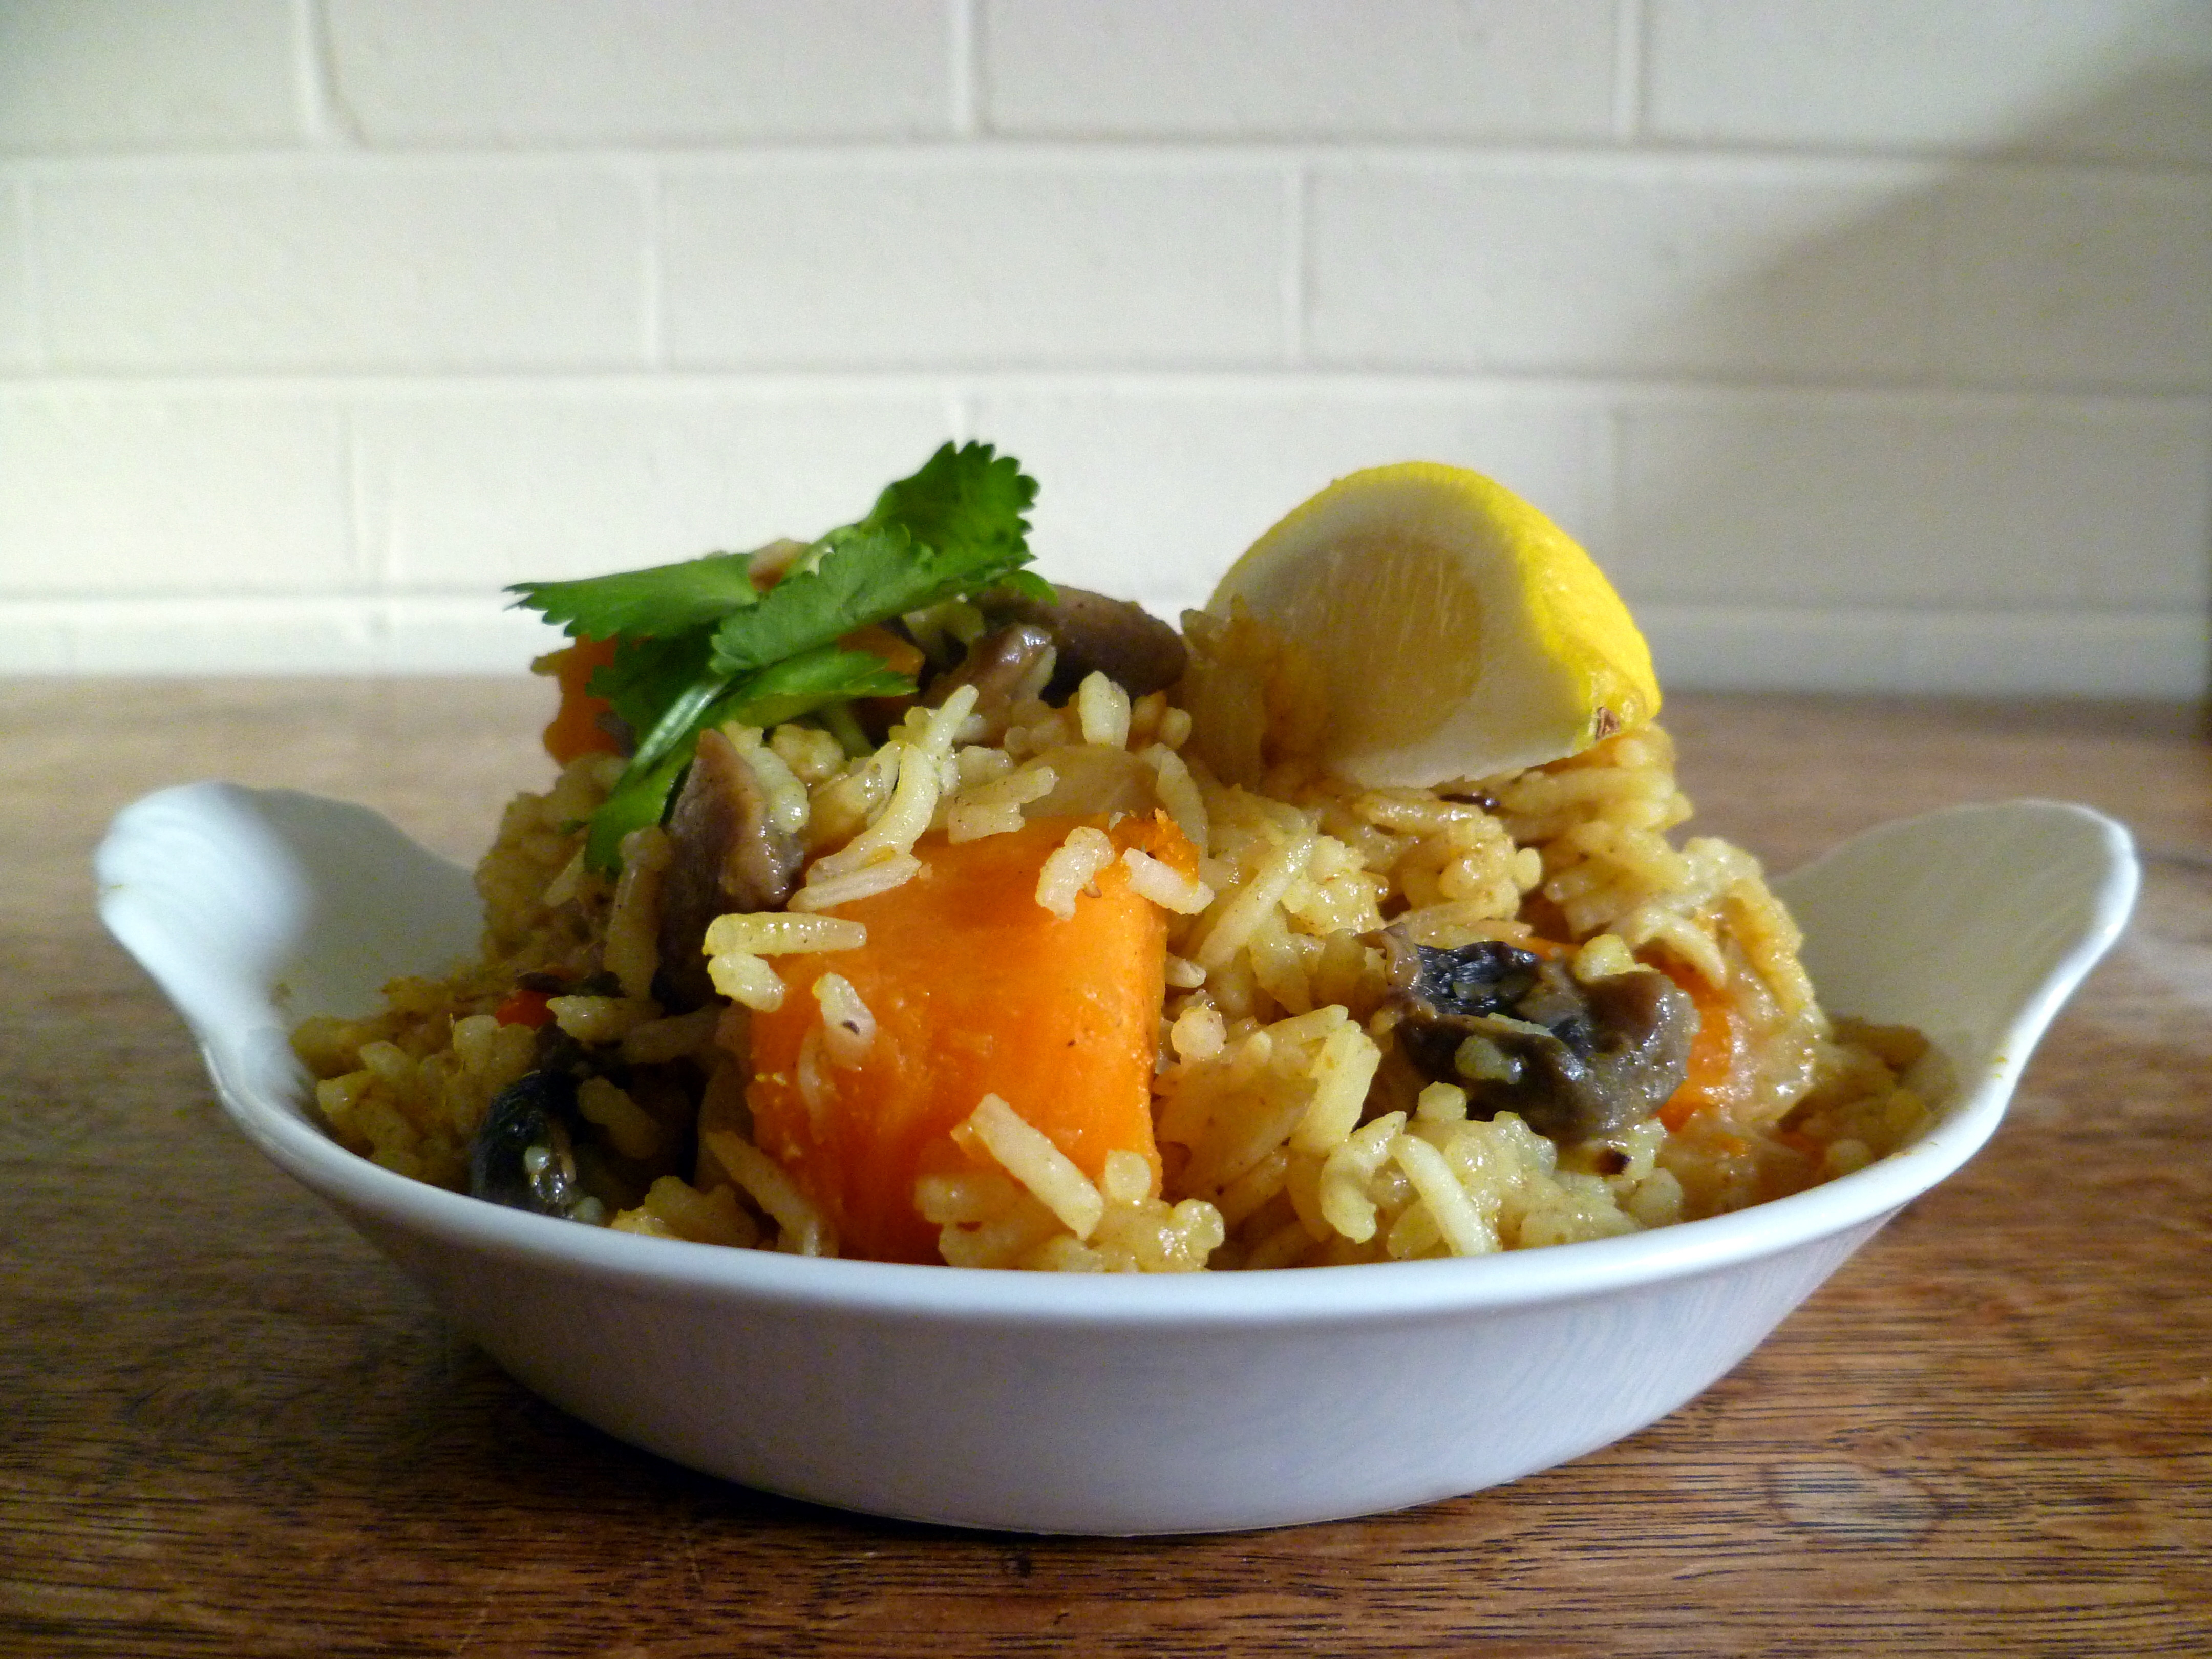 Indian Food Recipes Vegetarian  Healthy Indian Food Recipes Ve arian